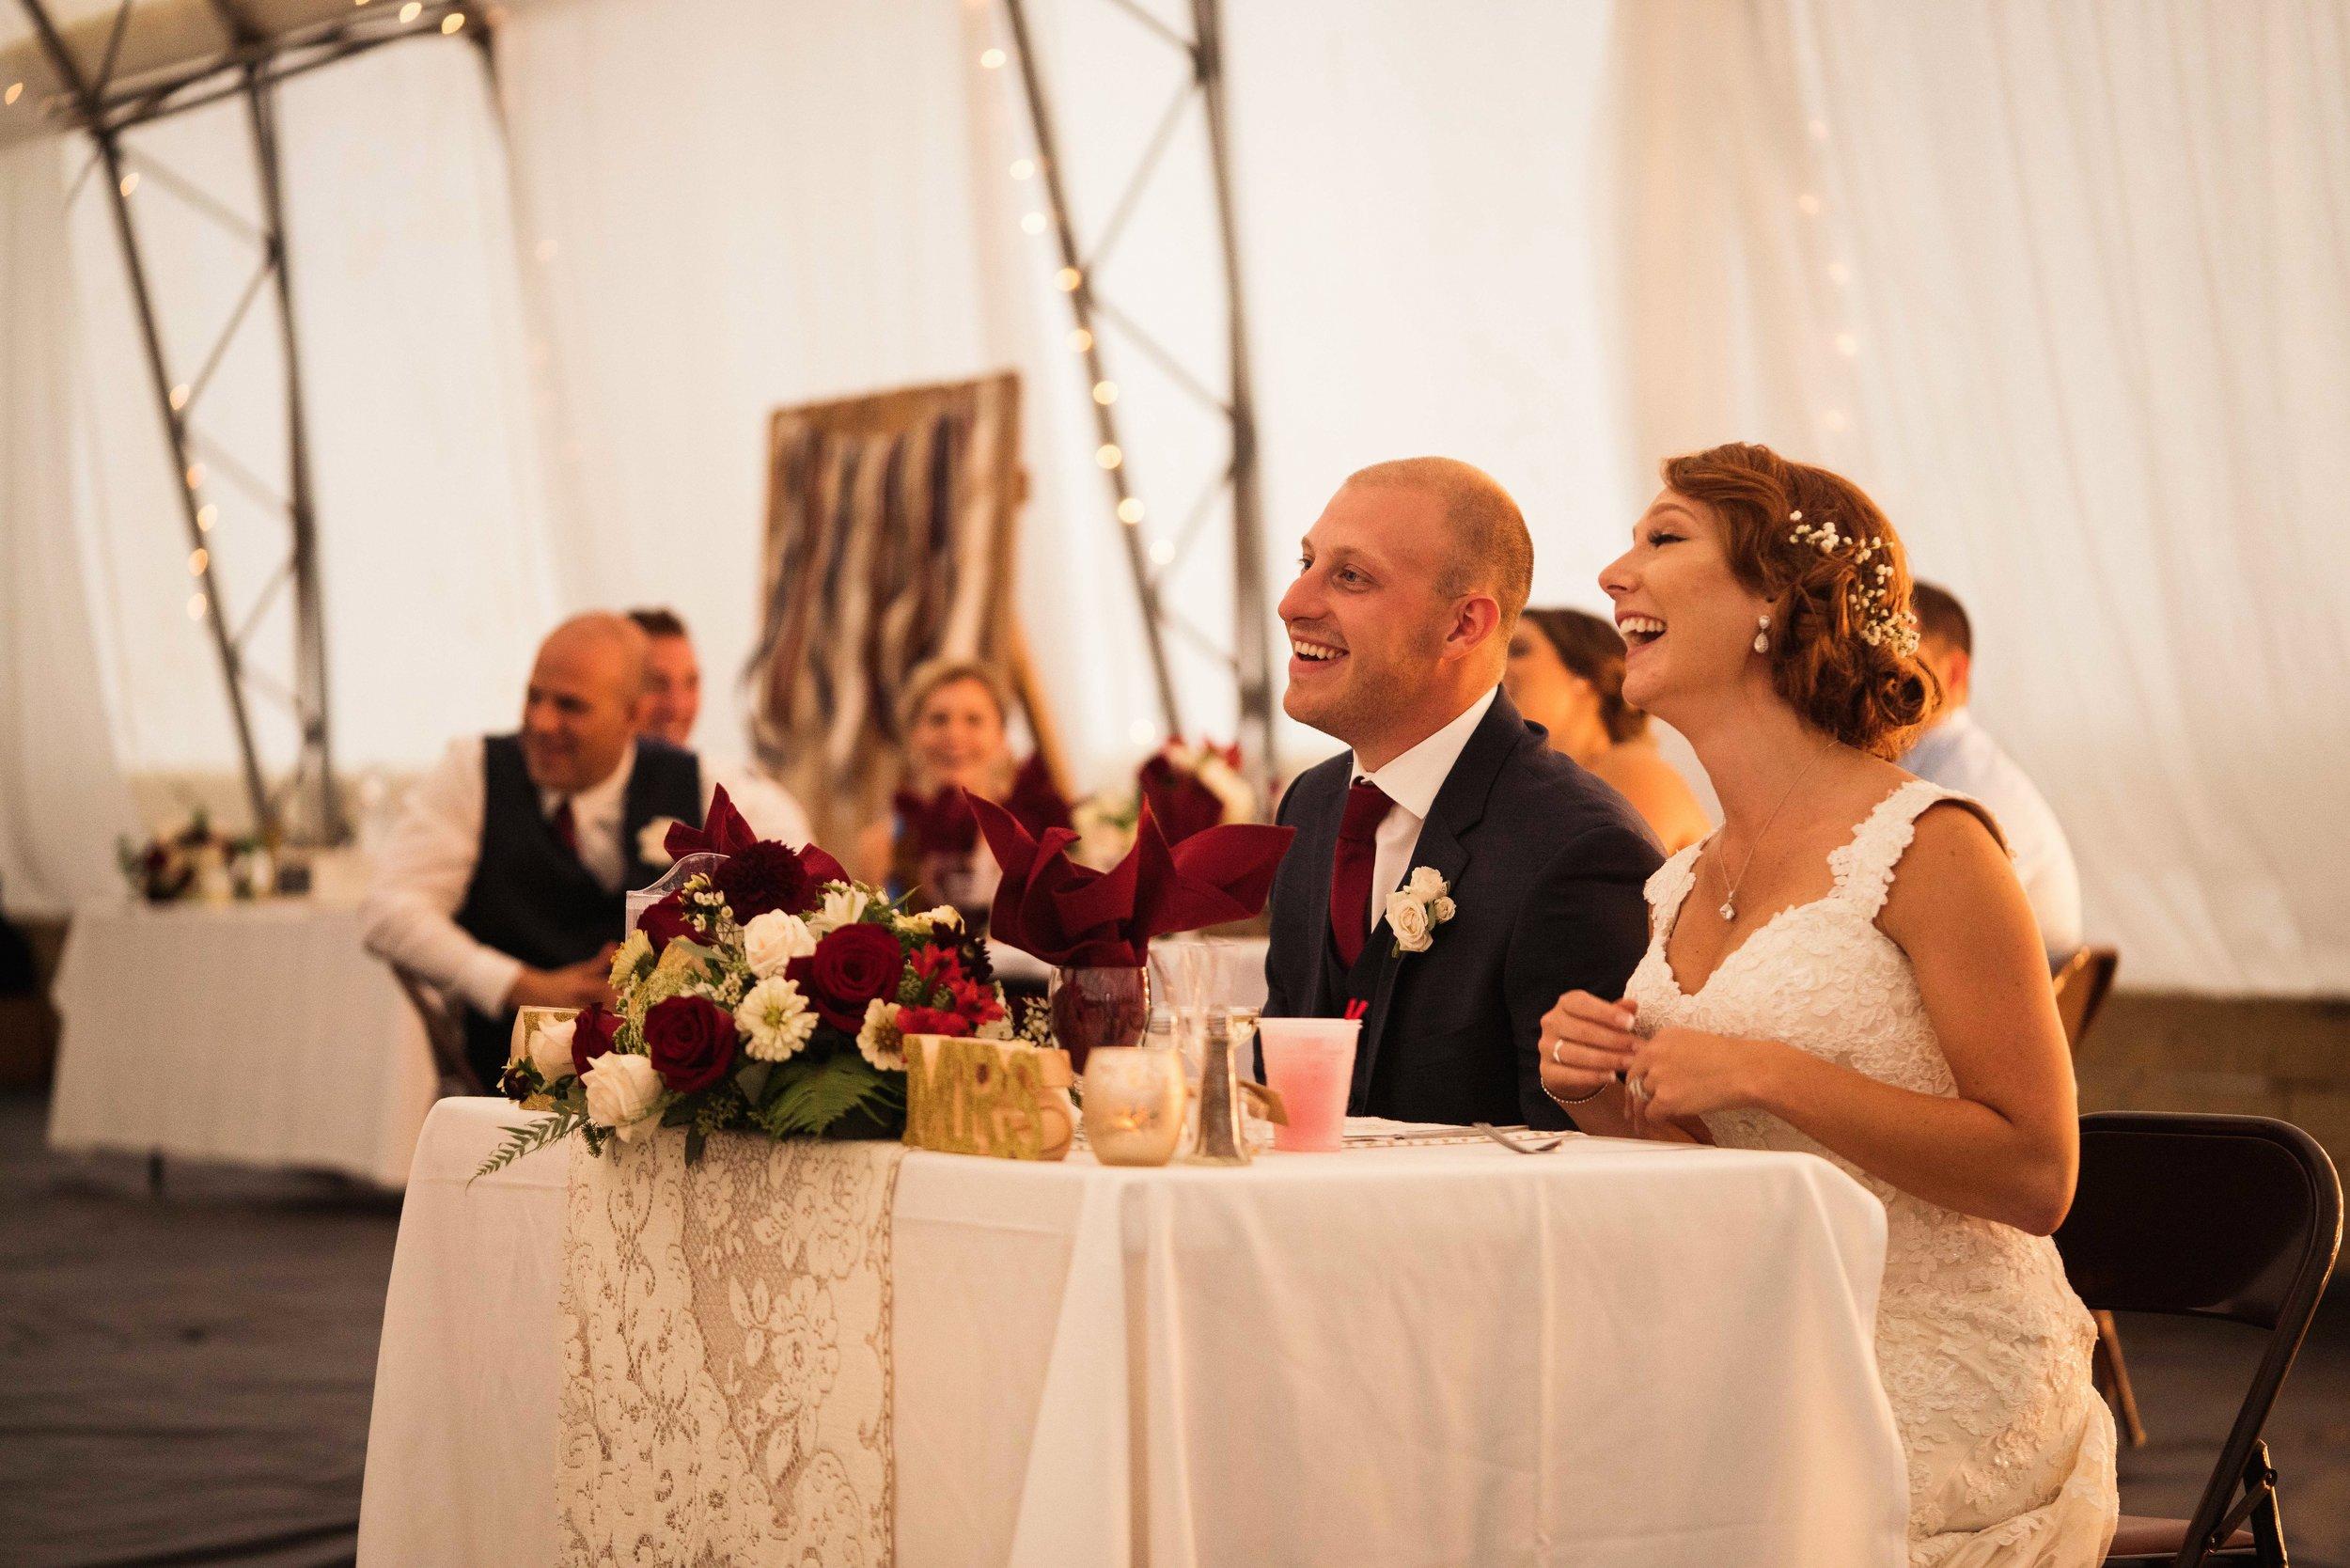 Blog-Lisa-James-Wedding-at Rosebud Estate Weddings in Arcade NY by Stefan-Ludwig-Photography-Buffalo-NY-68-x.jpg